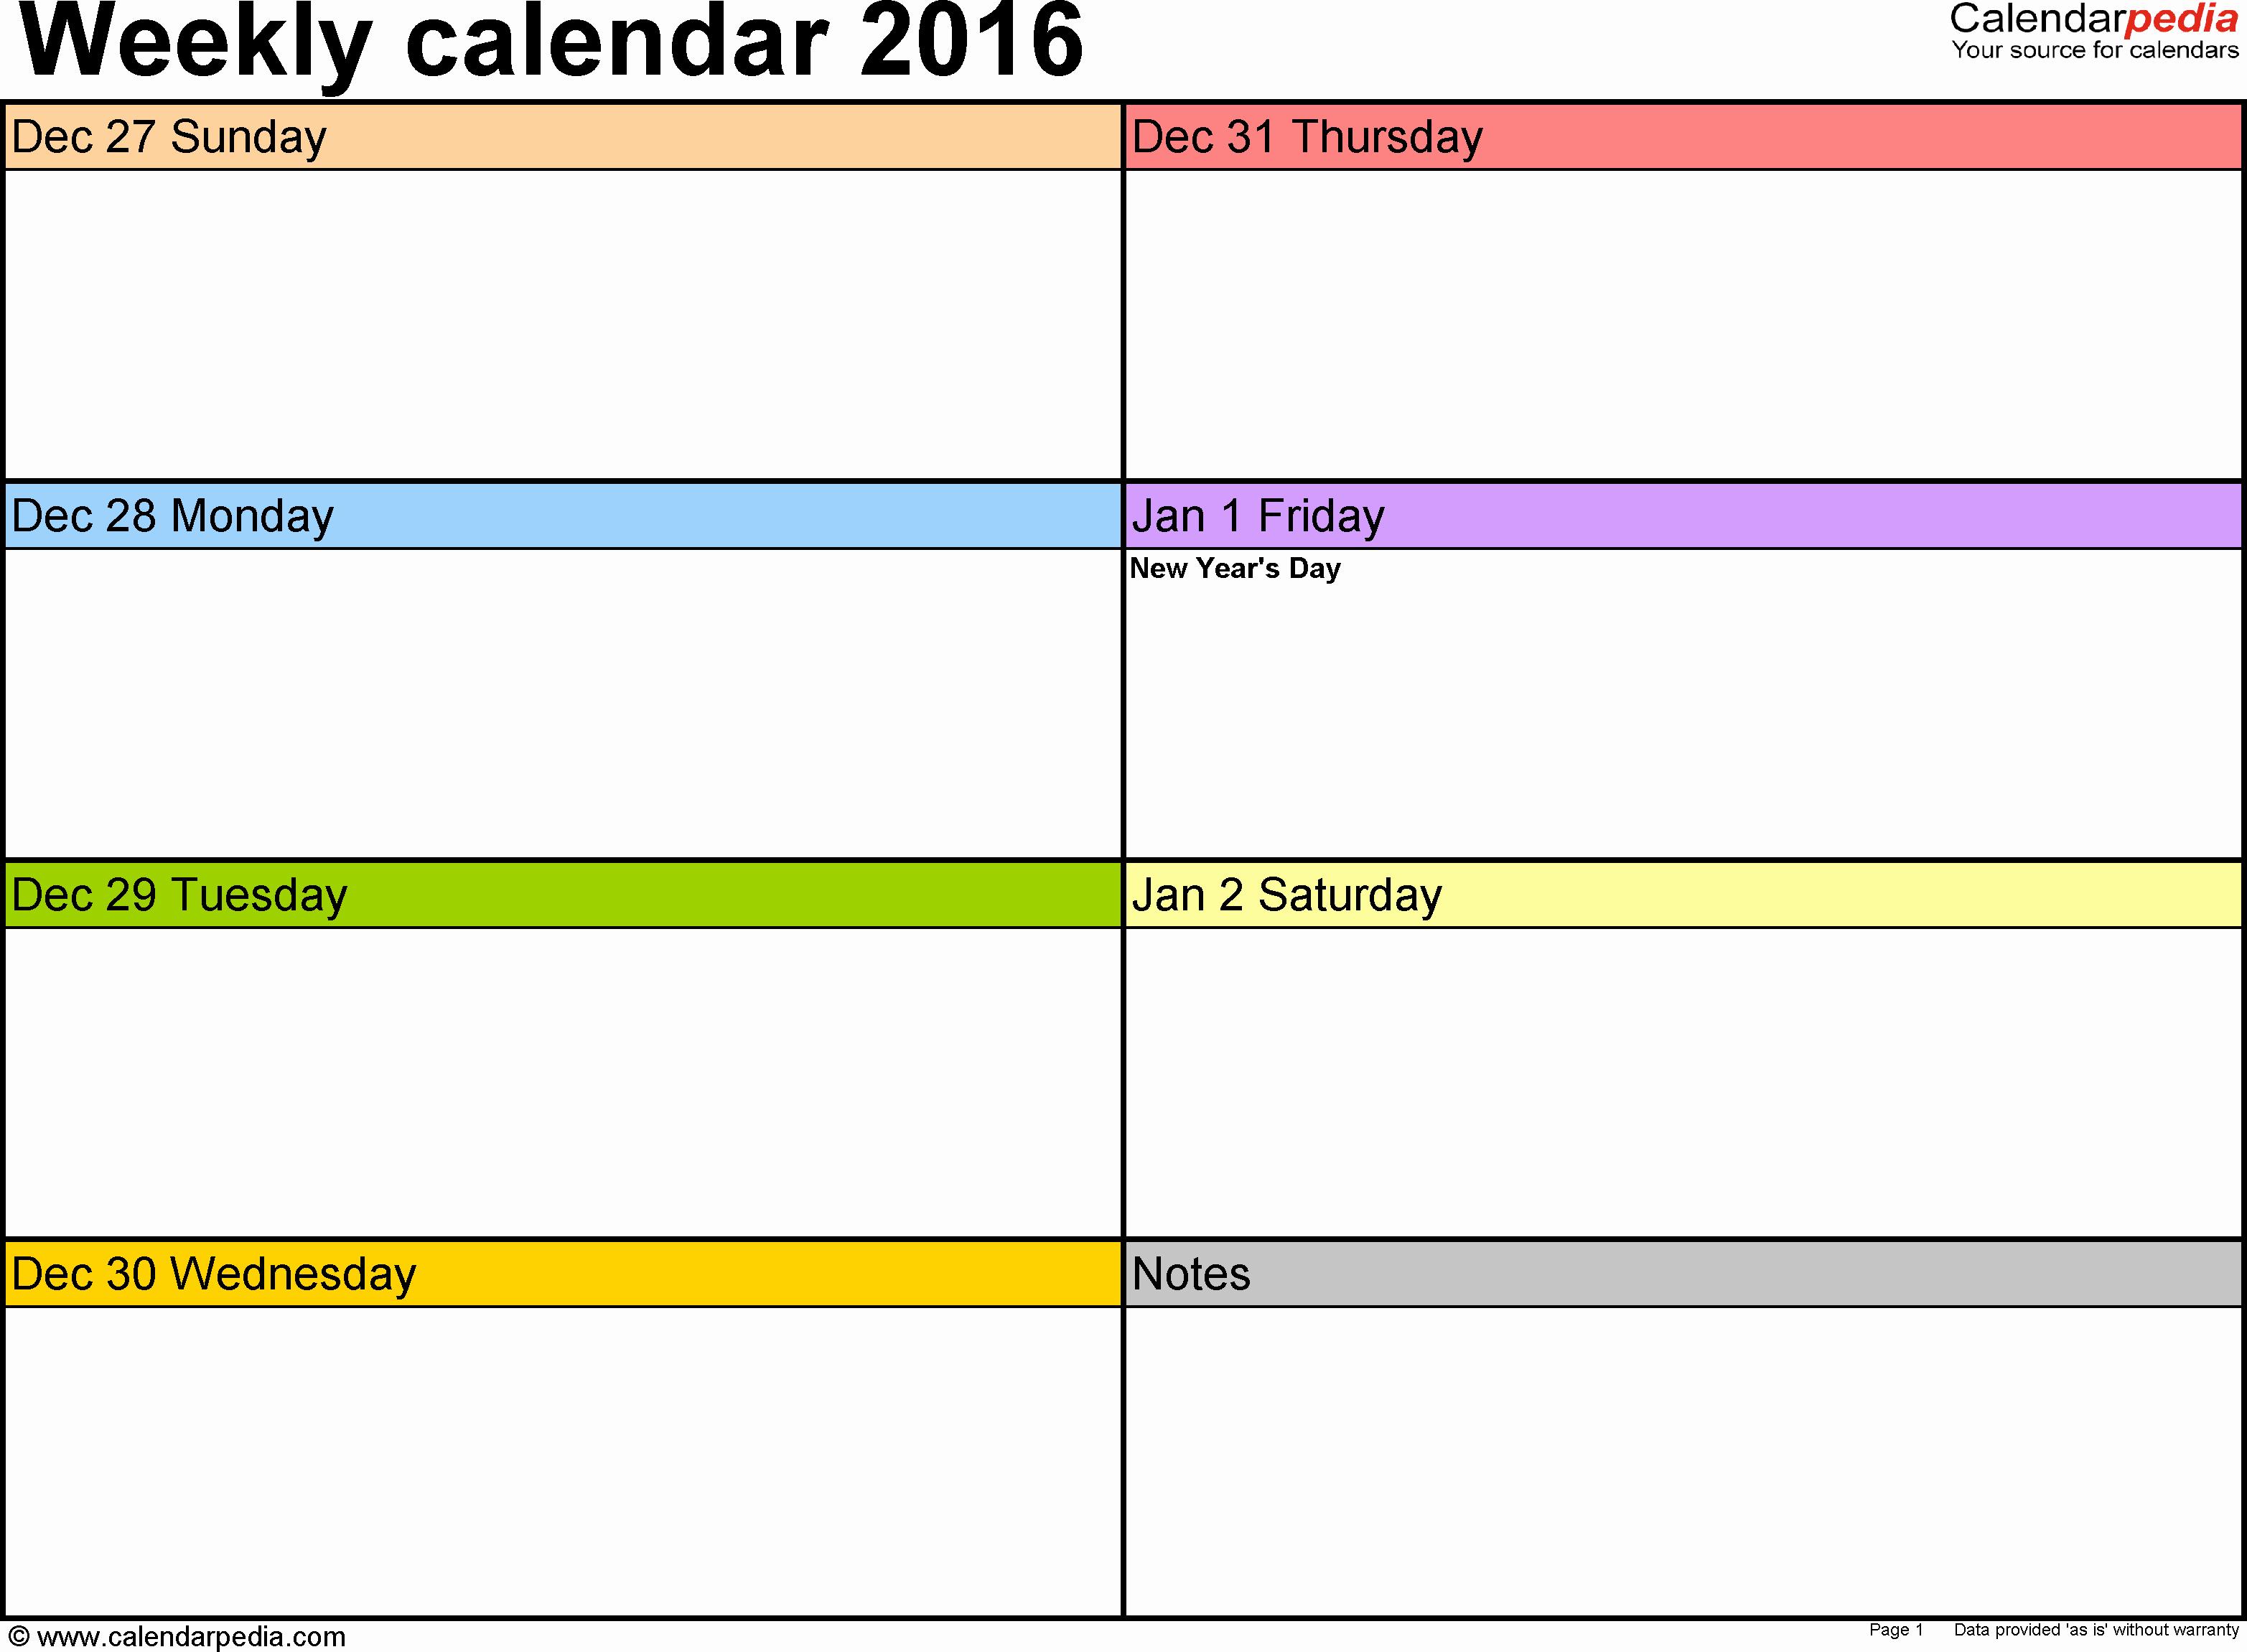 Microsoft Word Weekly Calendar Template Lovely Weekly Calendar 2016 for Word 12 Free Printable Templates